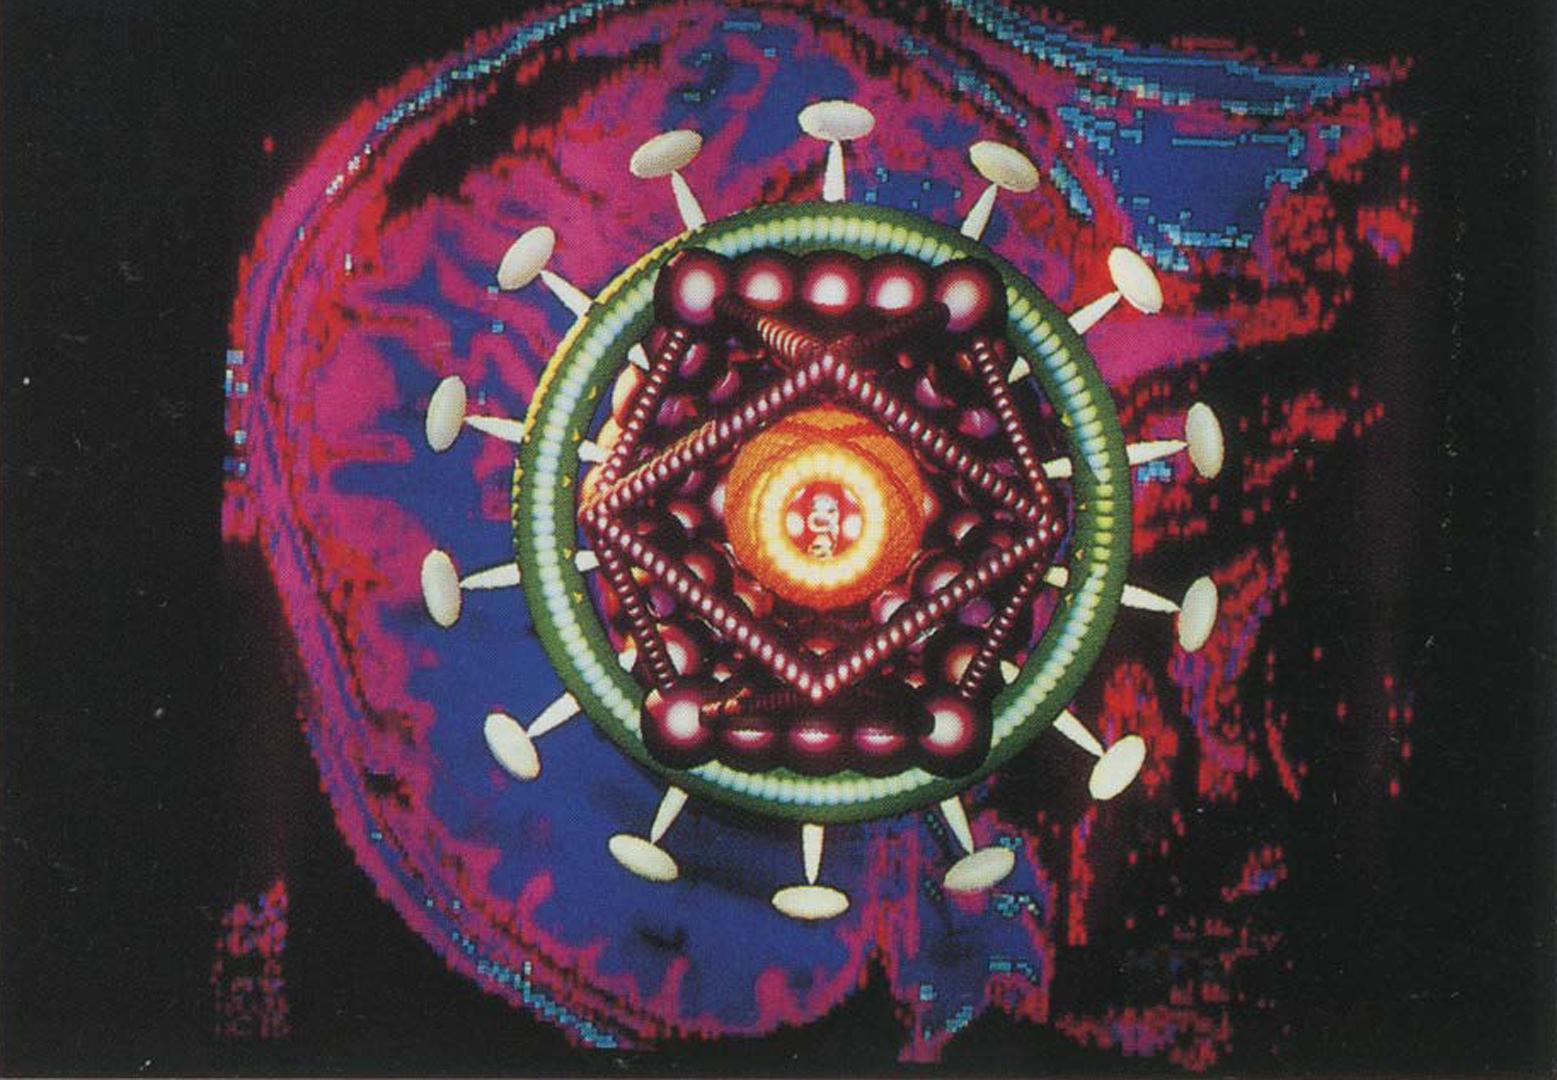 ©1990, ( art )n Laboratory, Robert Mapplethorpe/The Nineties